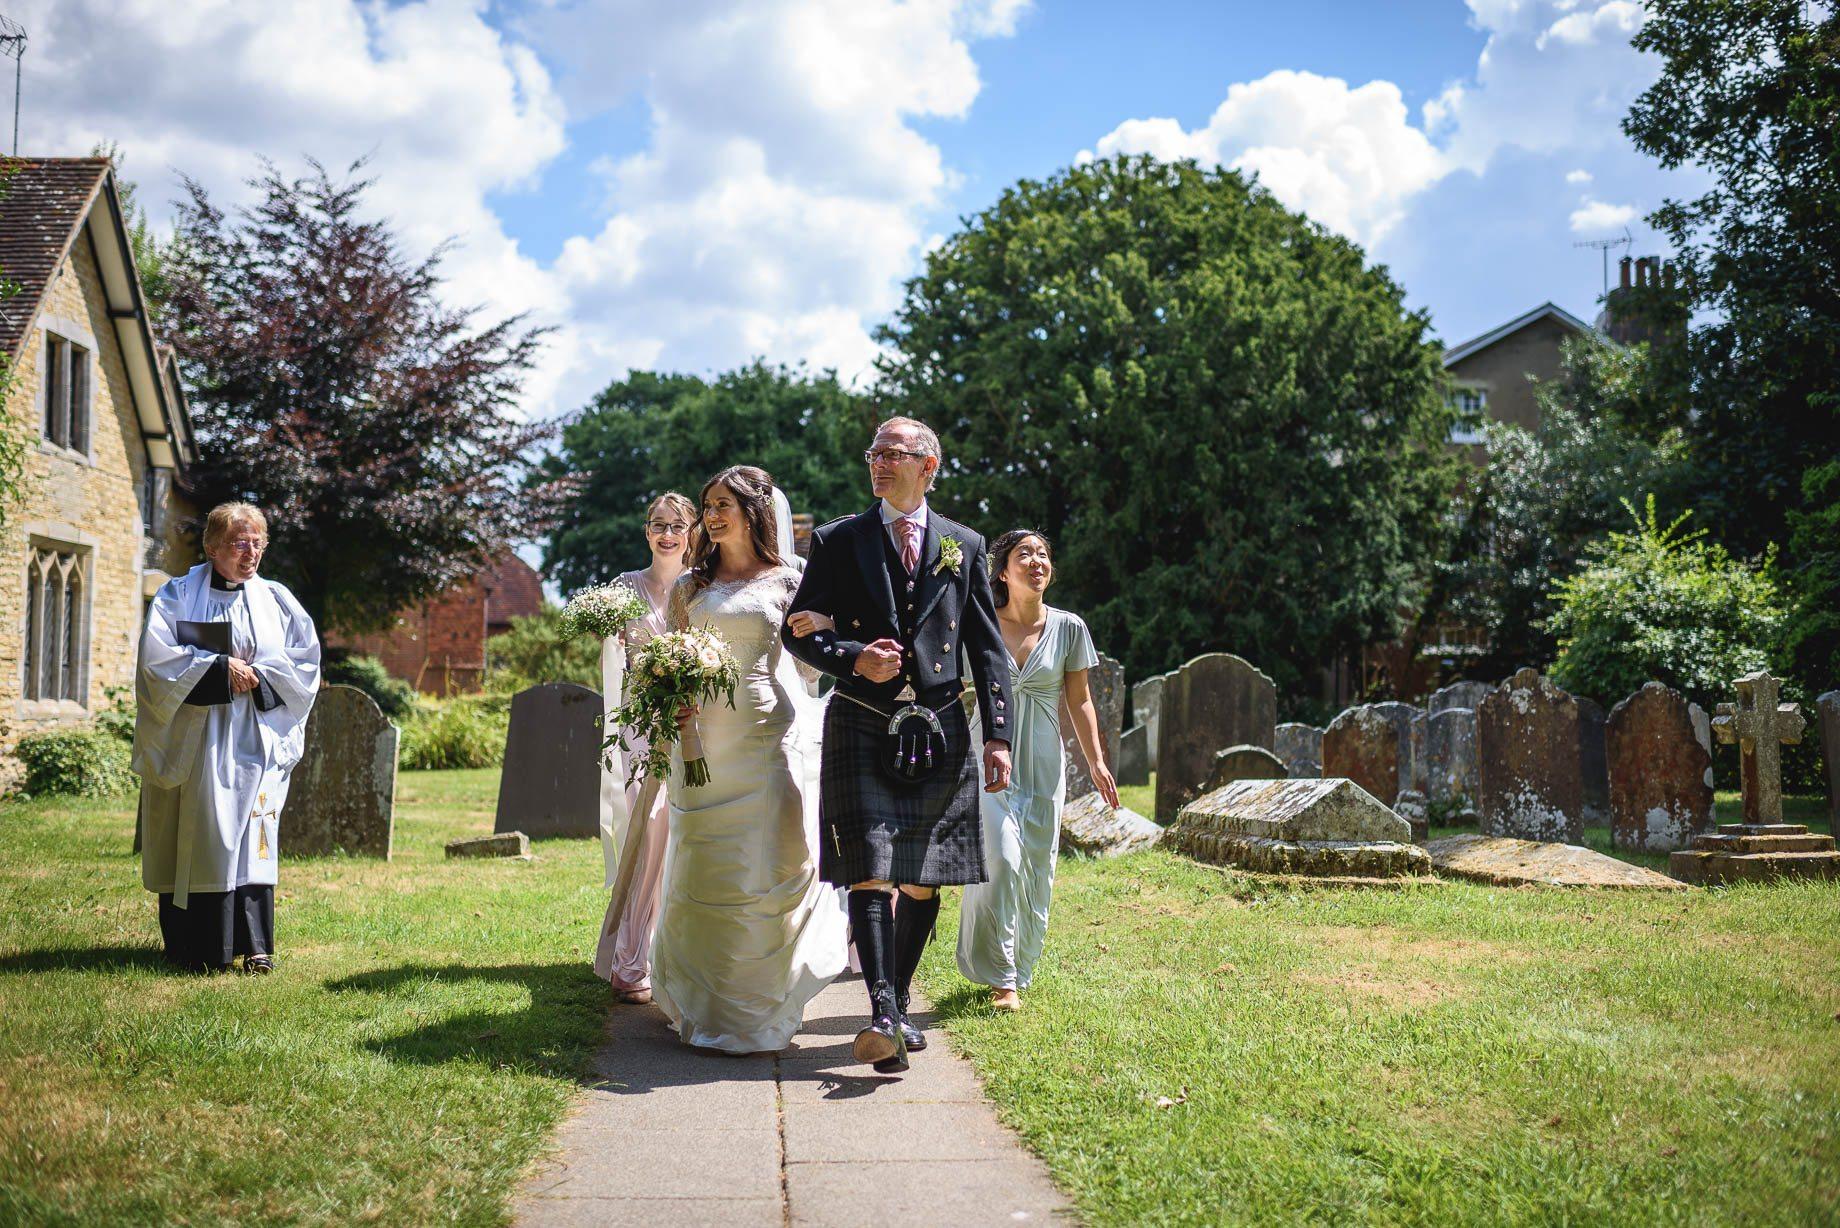 Gildings Barn wedding photography - Sarah and Steve (41 of 190)